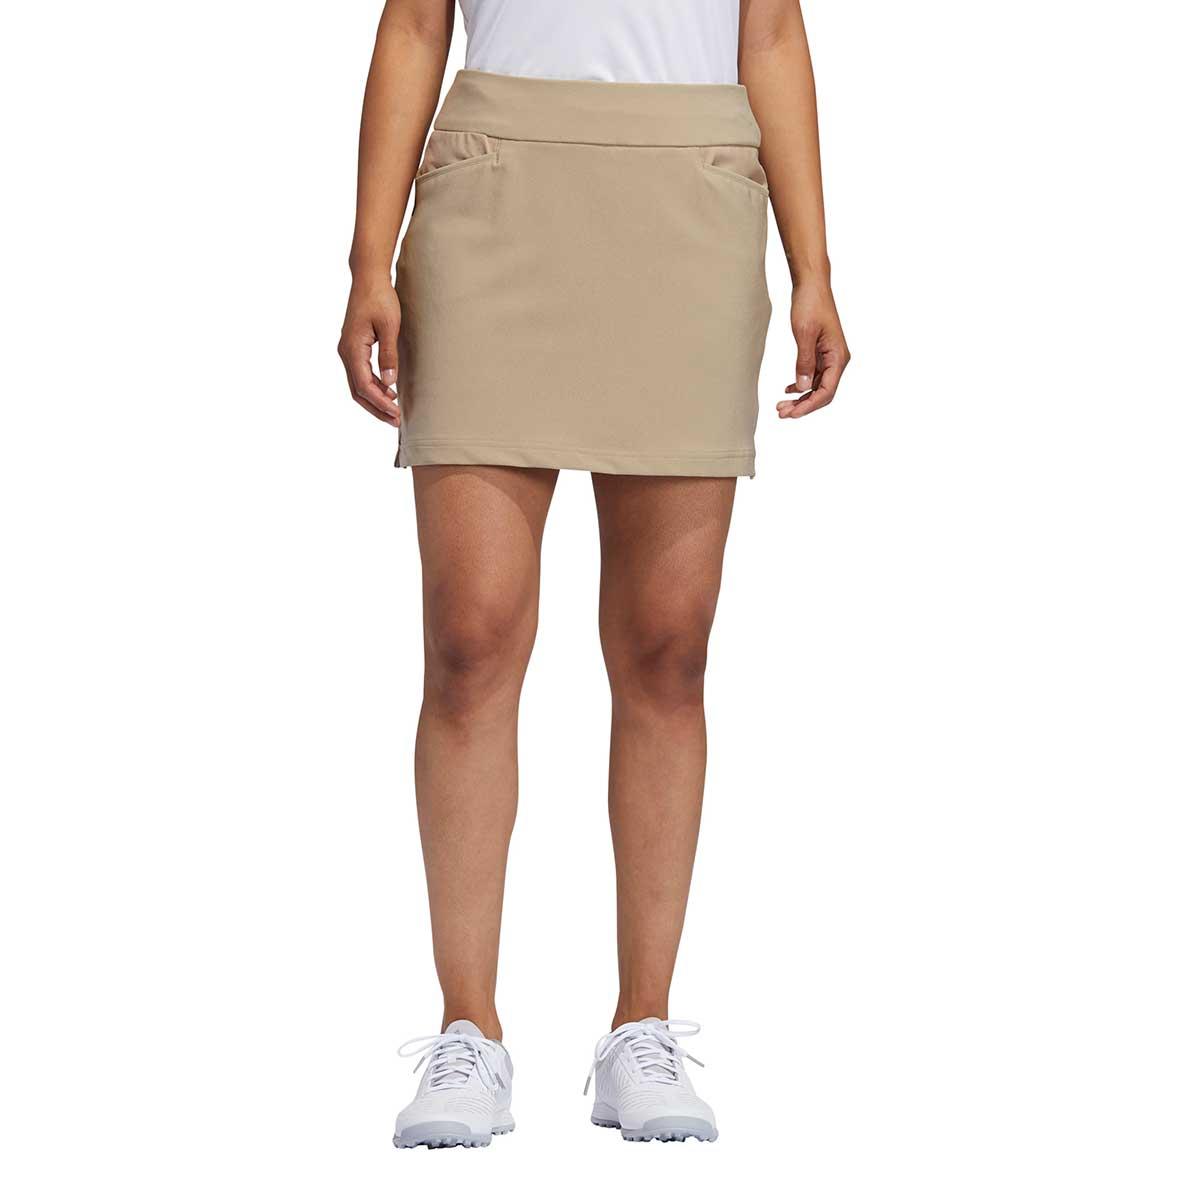 Adidas Women's Ultimate AdiStar Khaki Skort